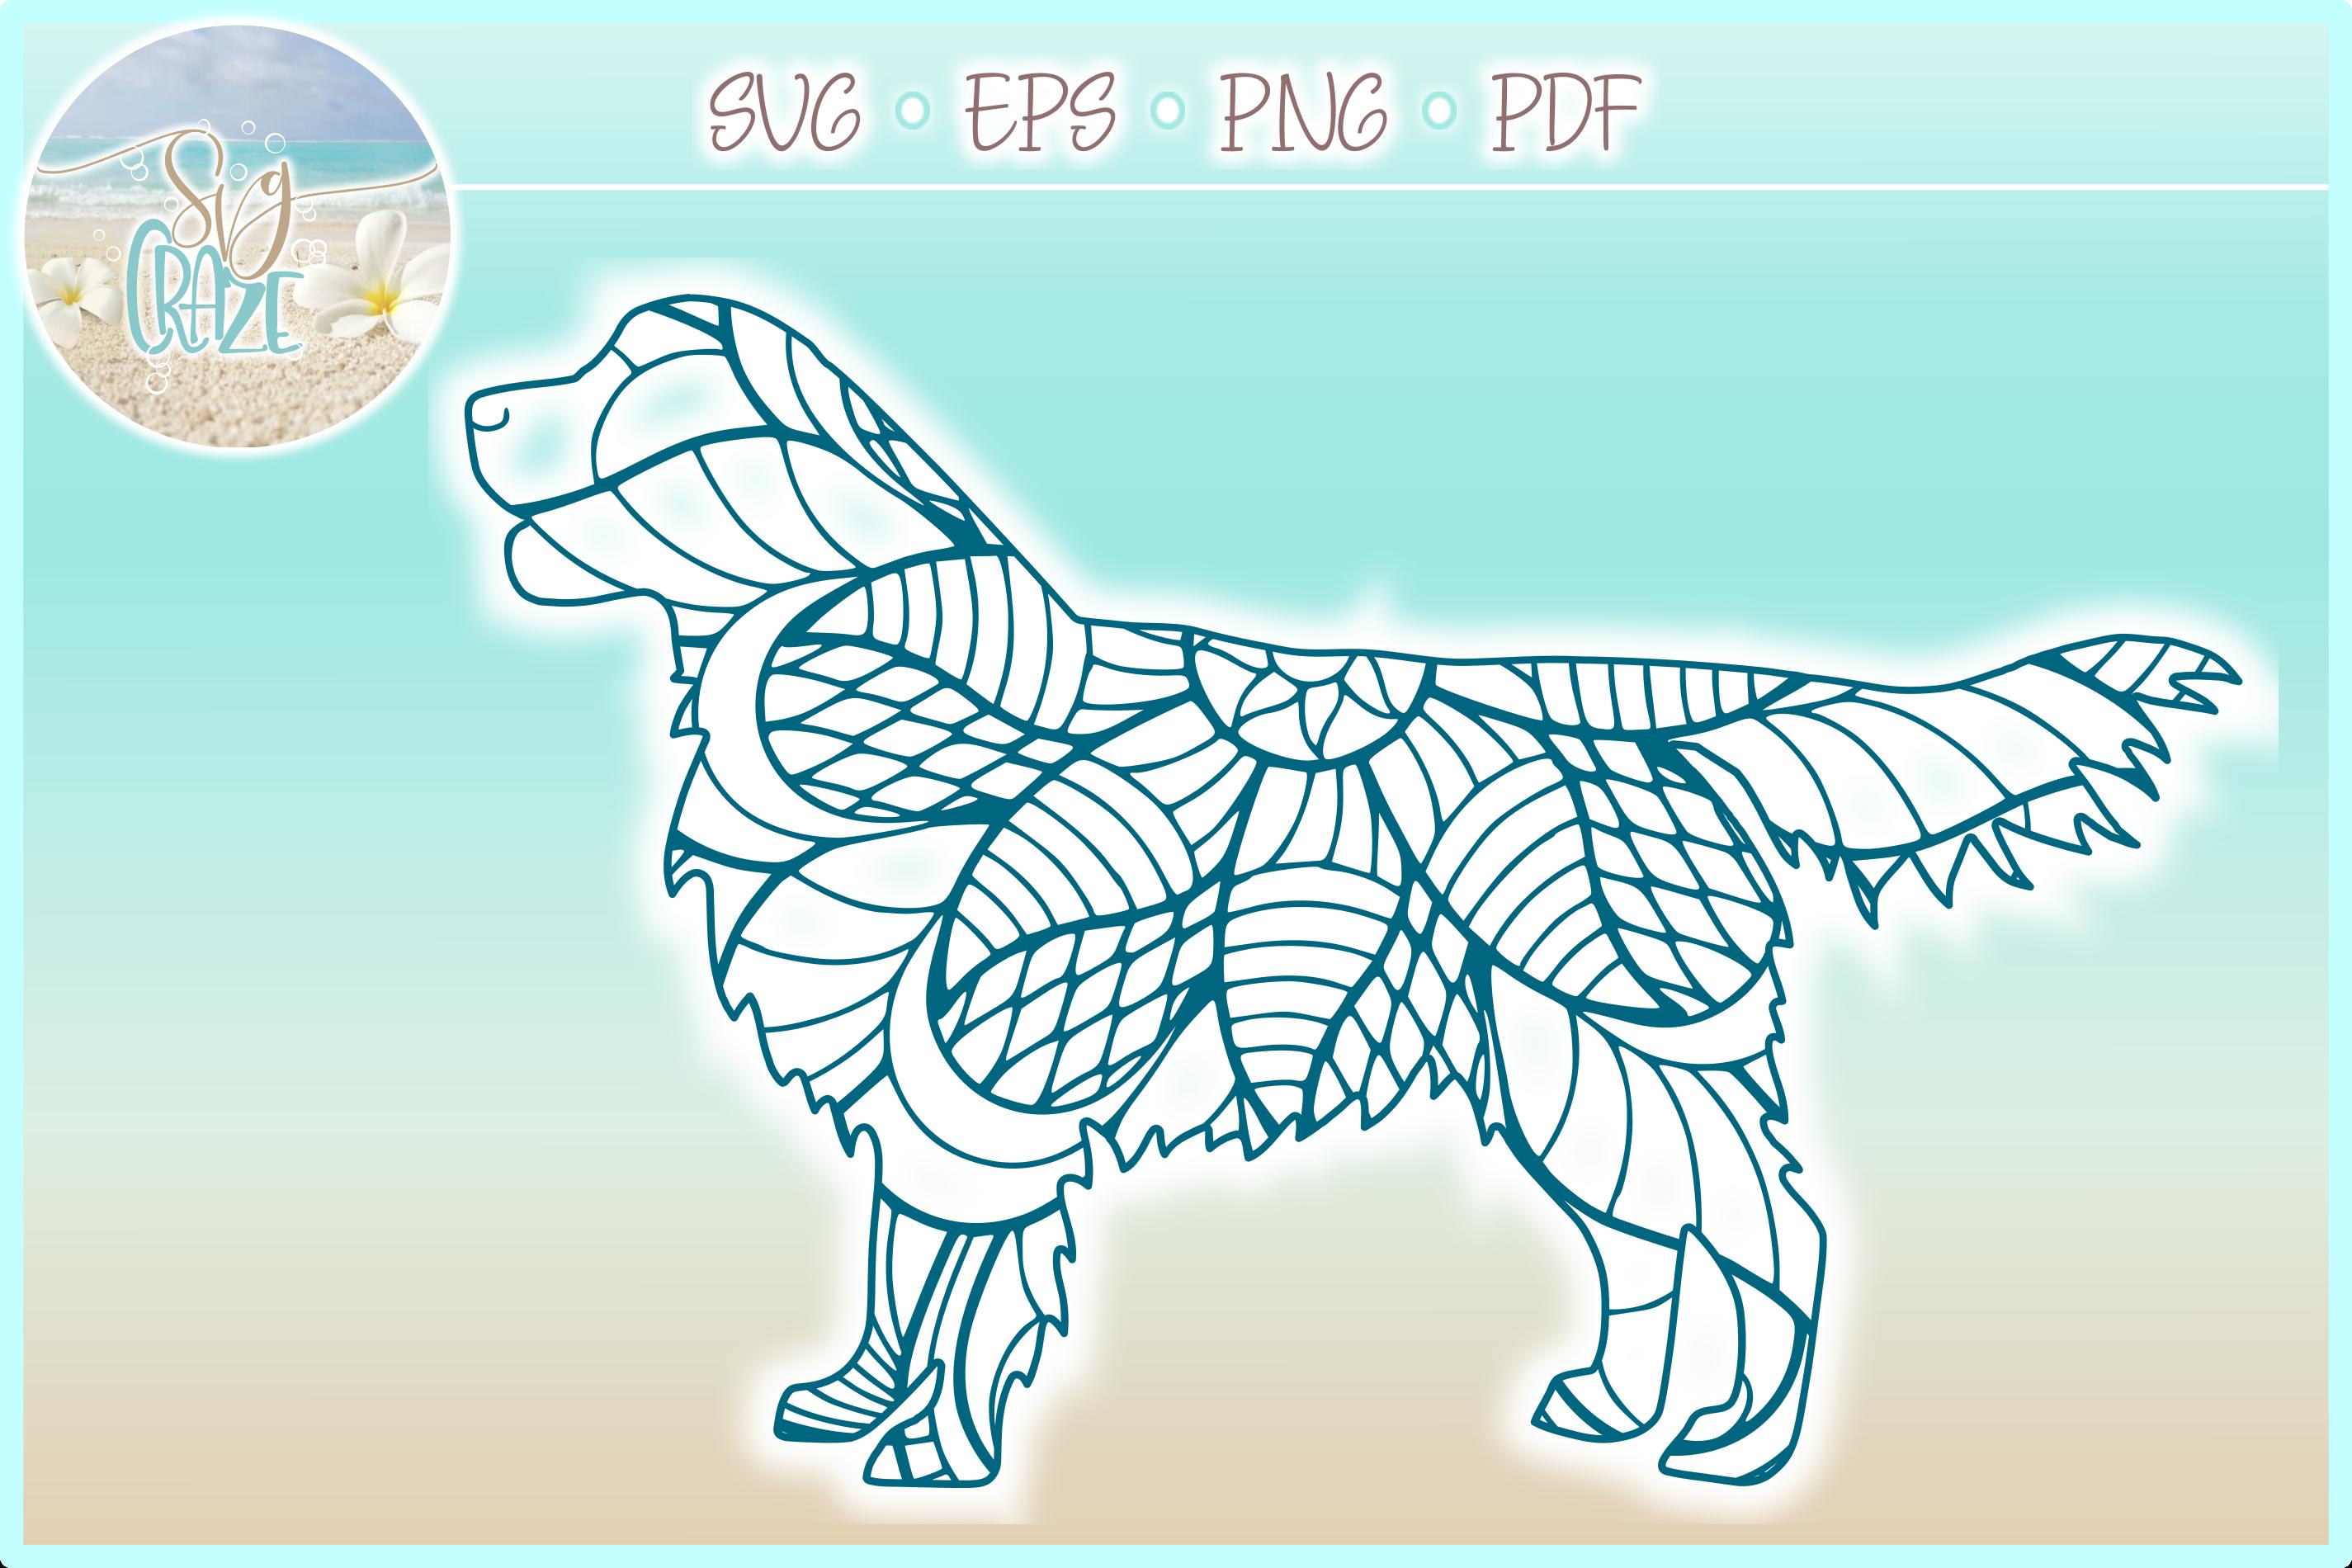 Golden Retriever Mandala Zentangle Bundle SVG Eps Png PDF example image 4